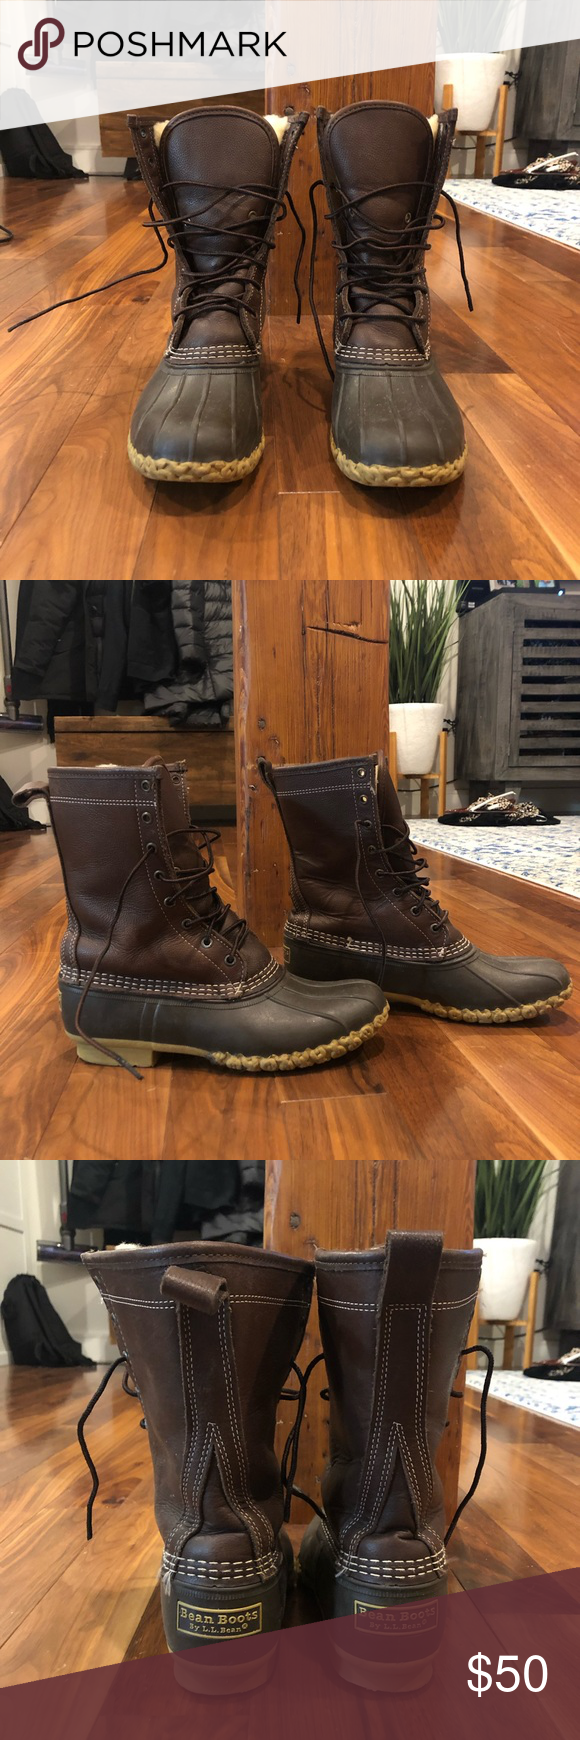 Boots by L.L.Bean®, 10